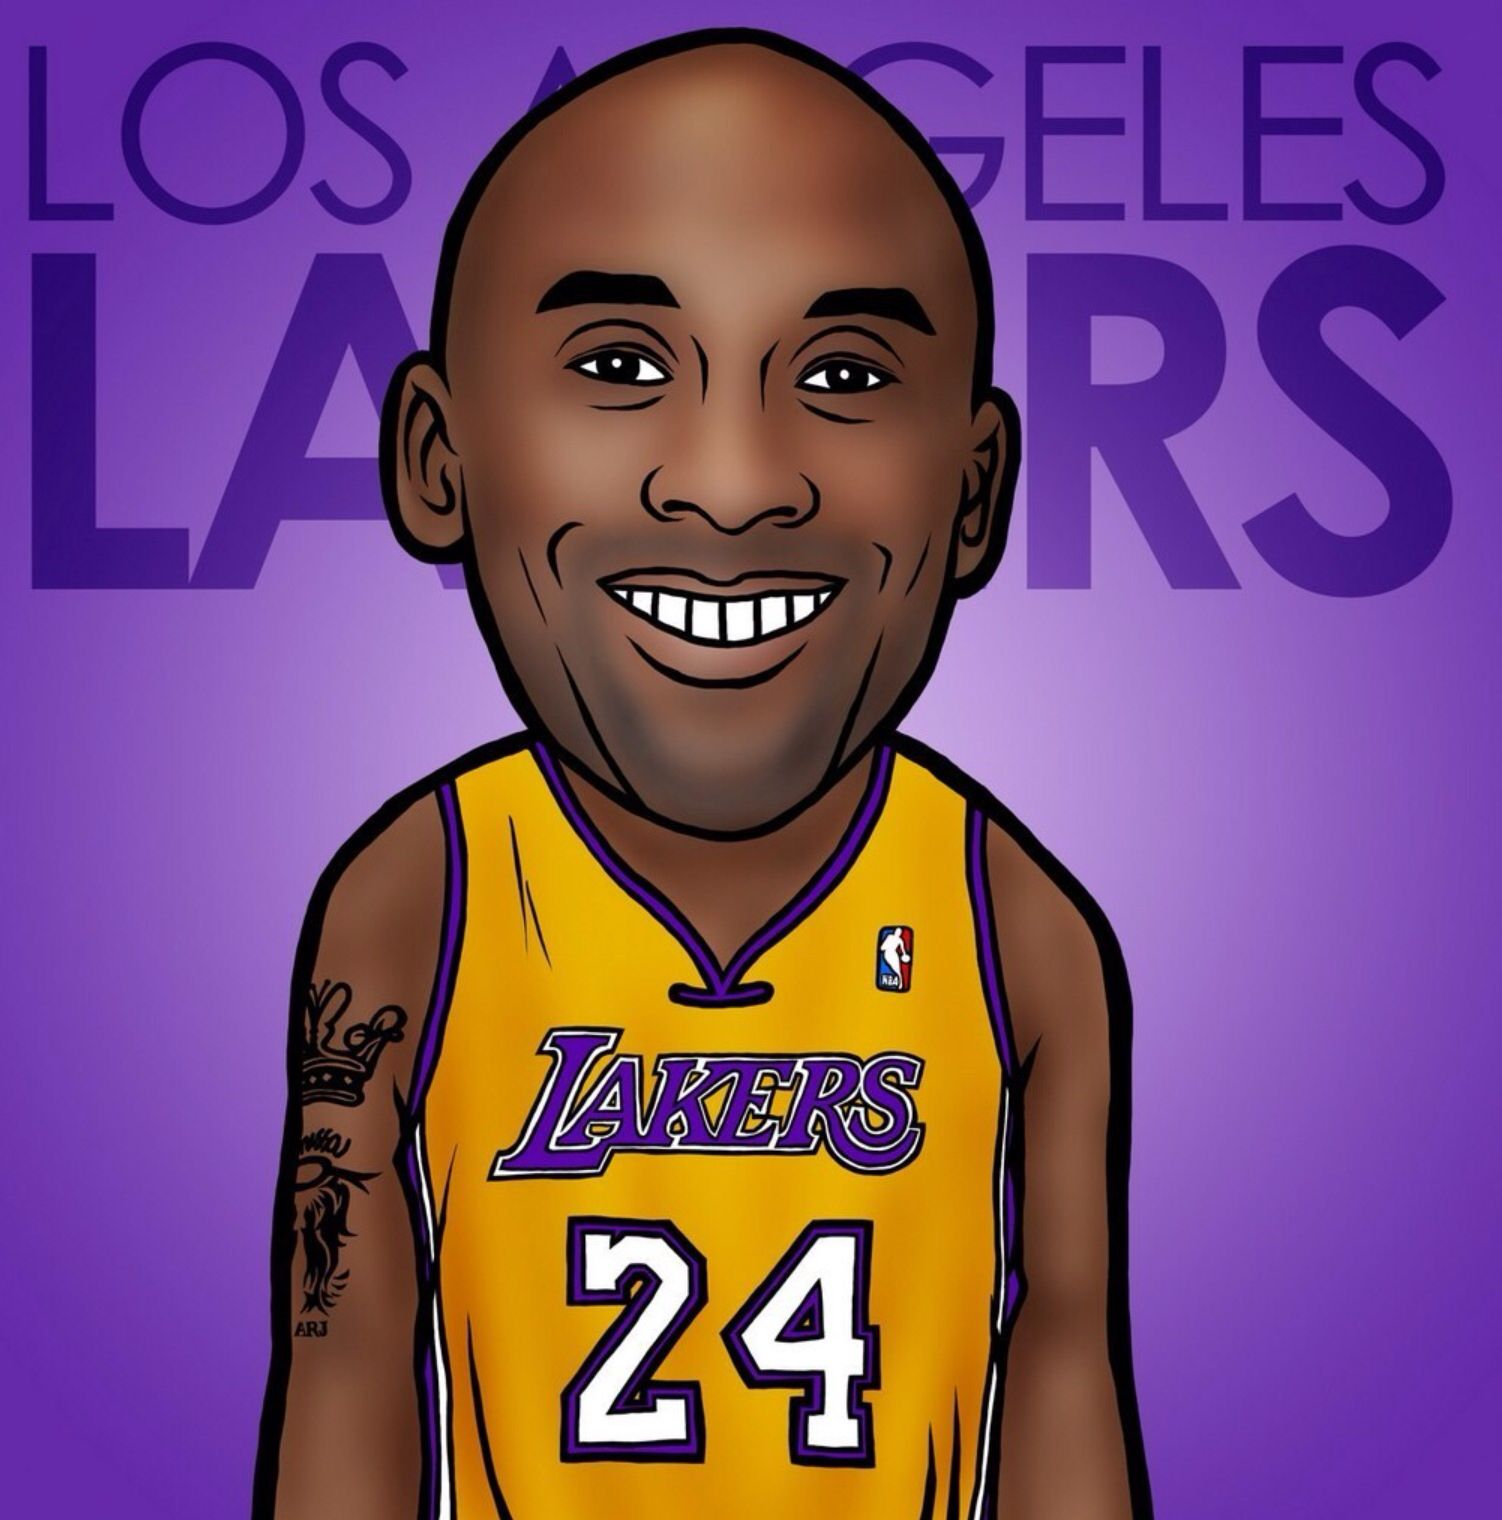 Kobe Bryant Nba Cartoon Image Nba Players Nba Nba Trades